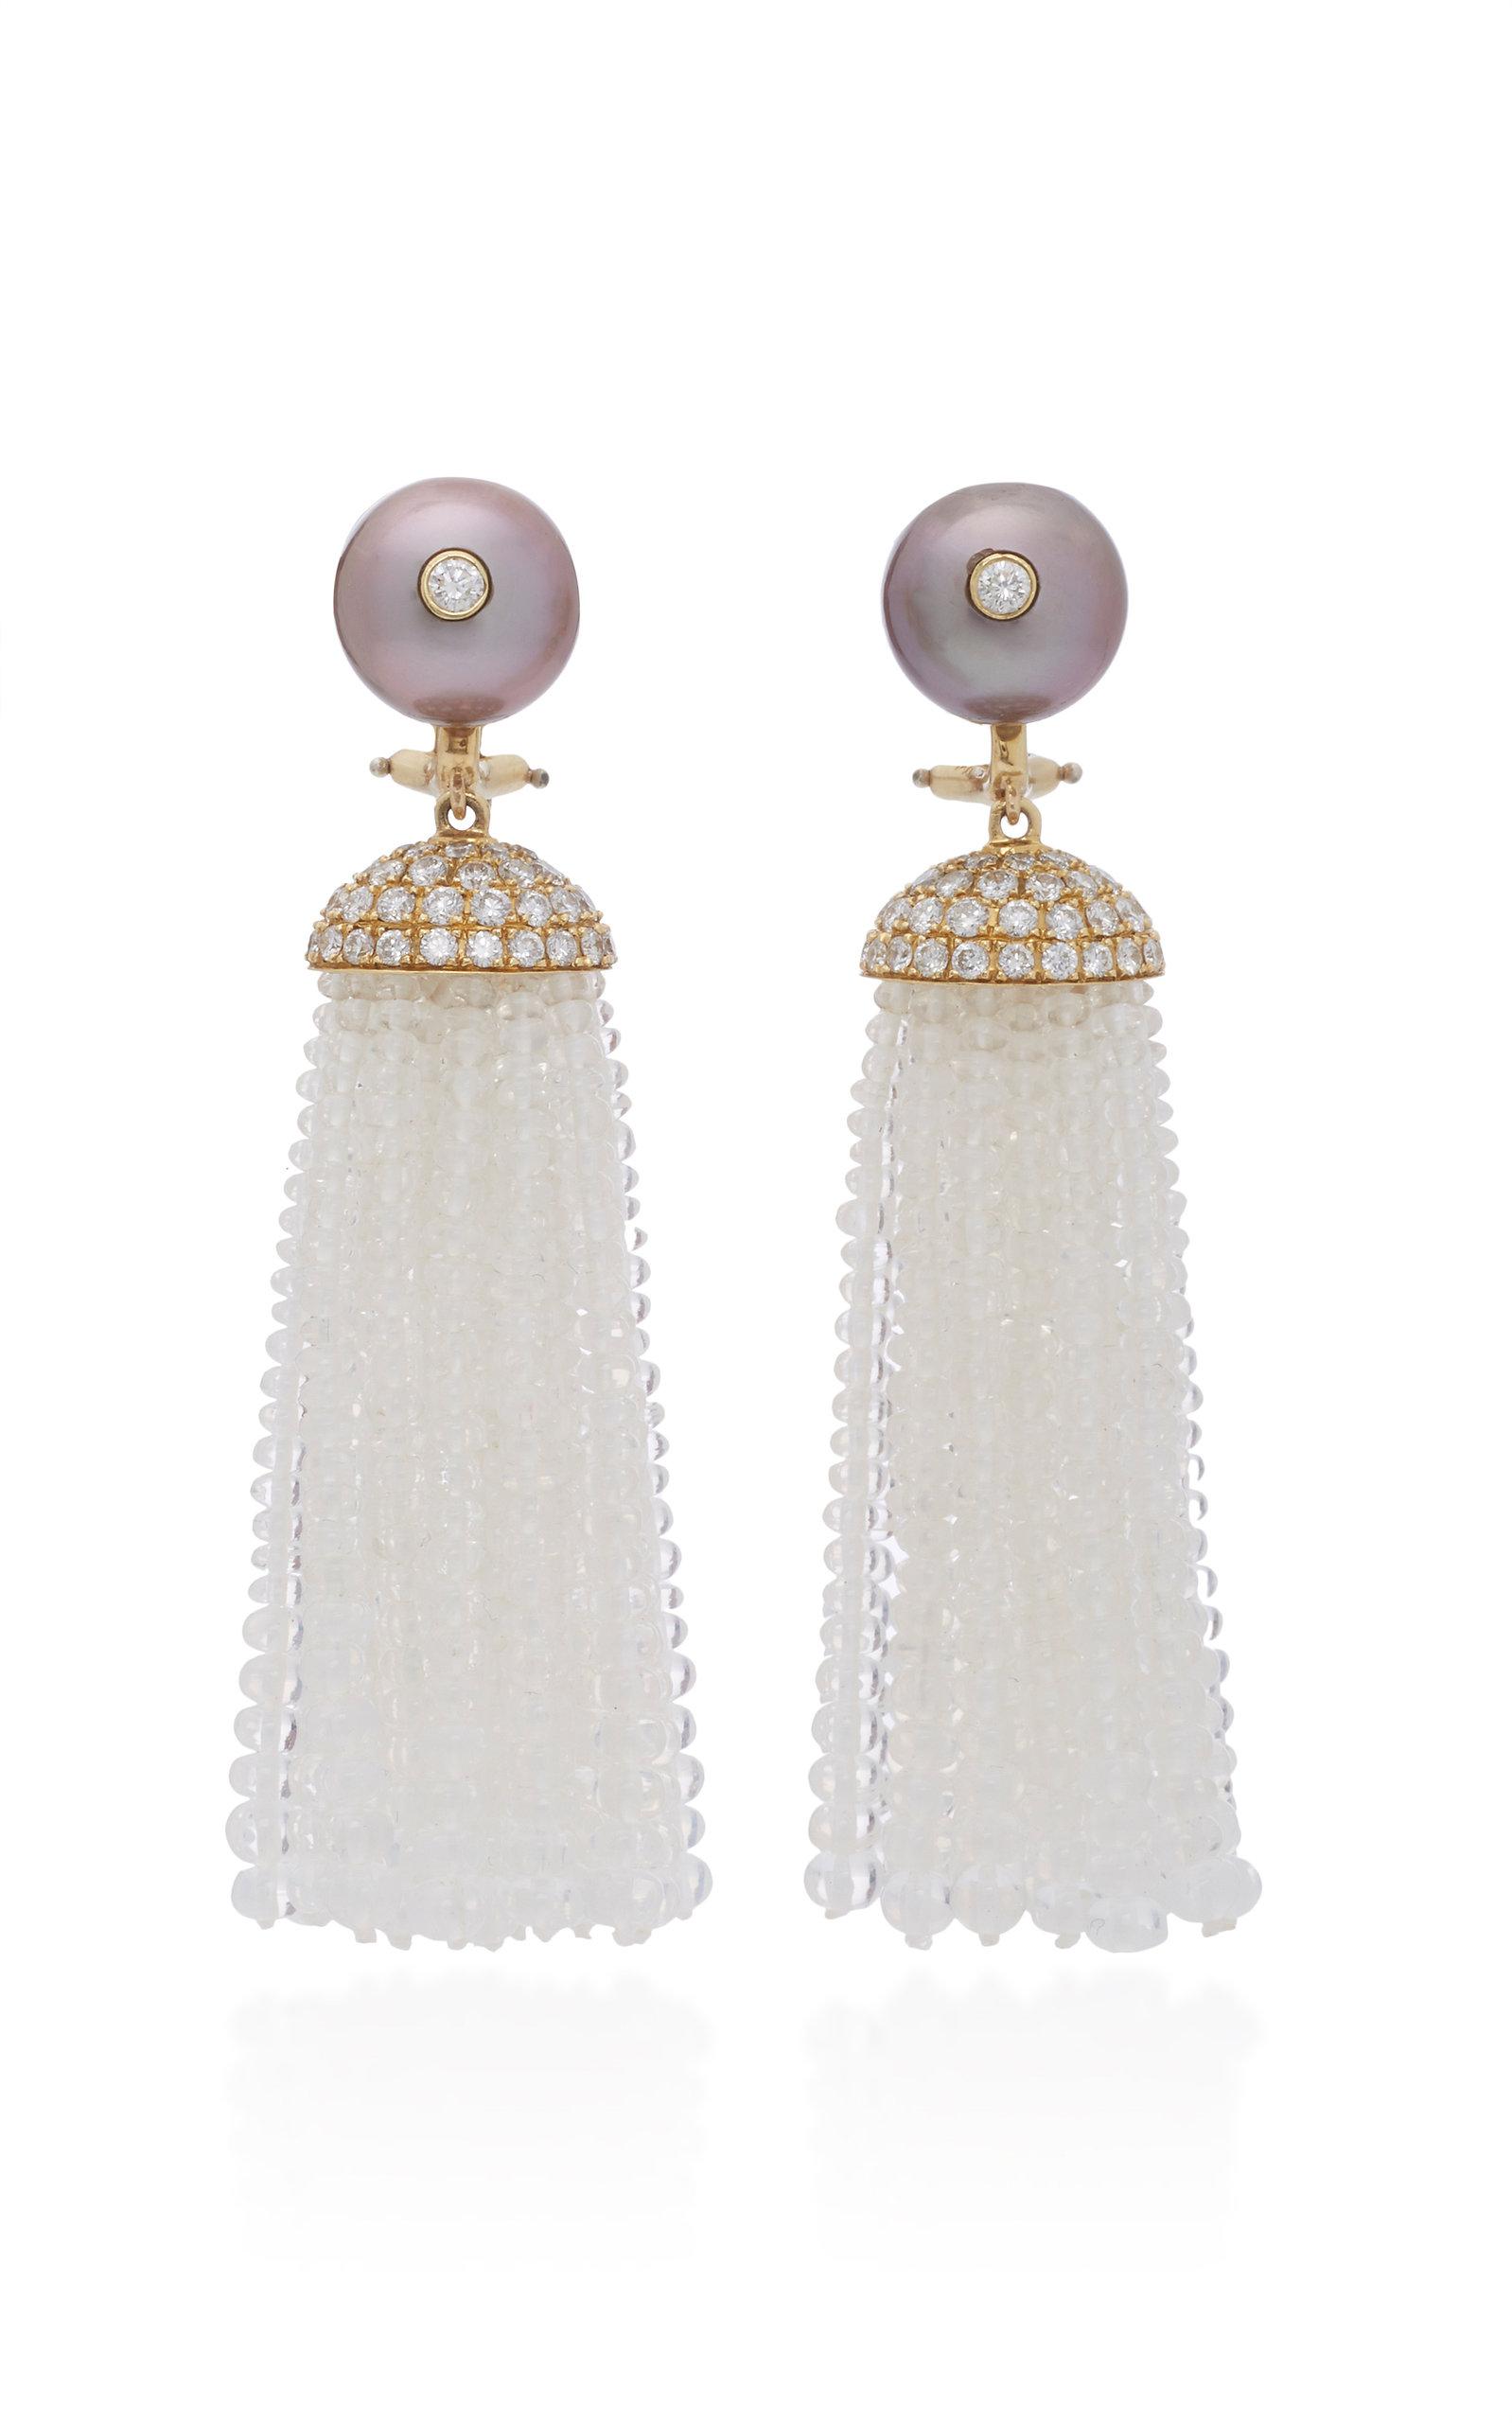 GOSHWARA 18K Gold Pearl Moon Quartz And Diamond Tassel Earrings in White